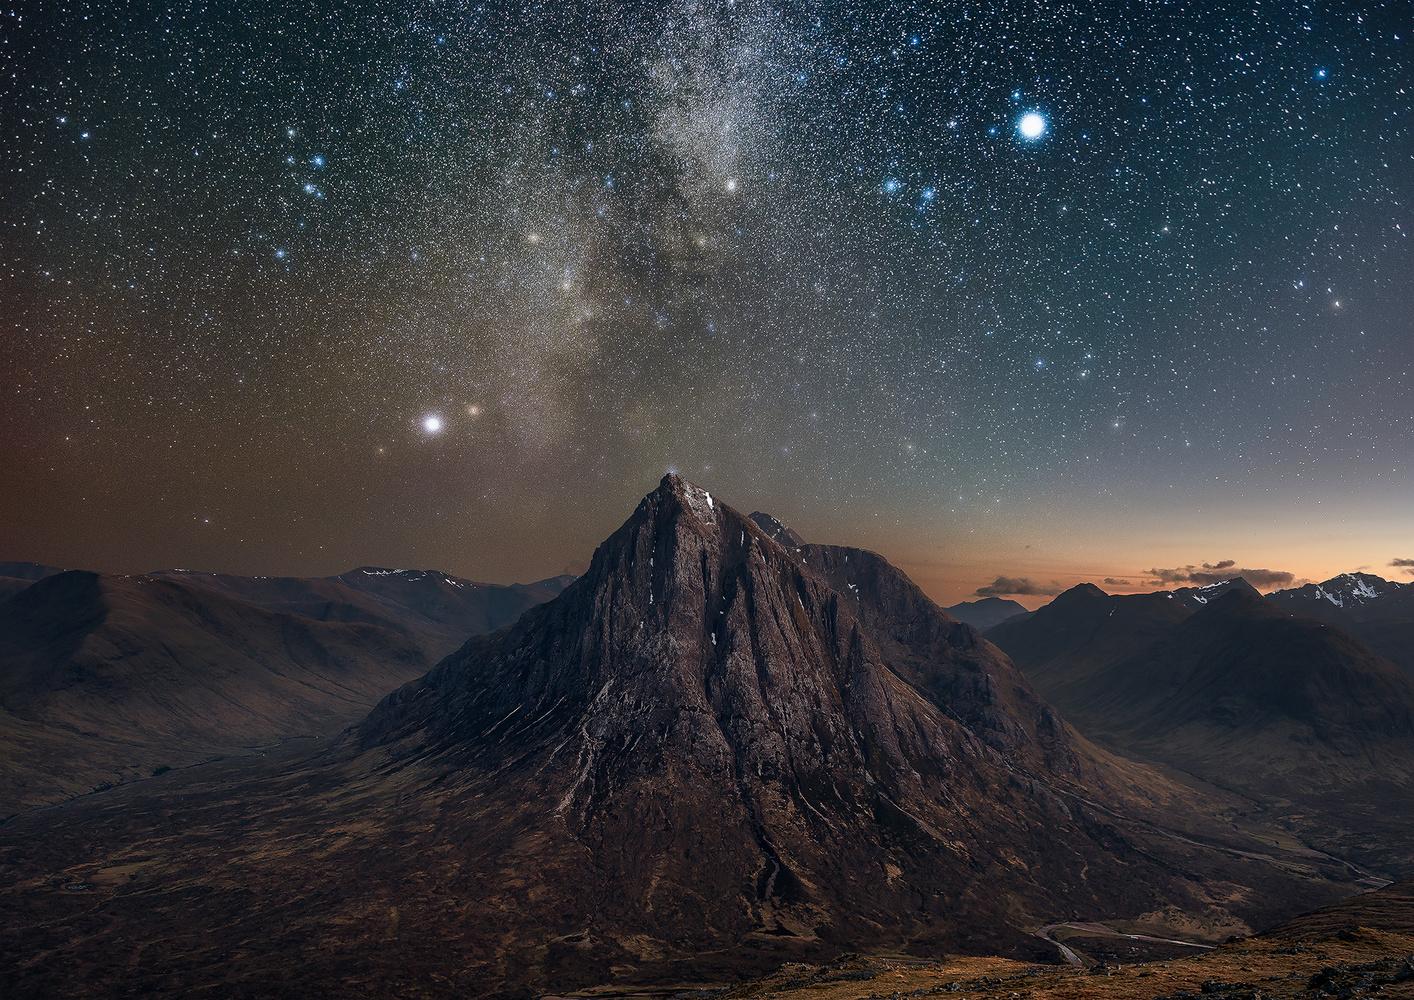 Billion Star Icon by Sylvan Buckley